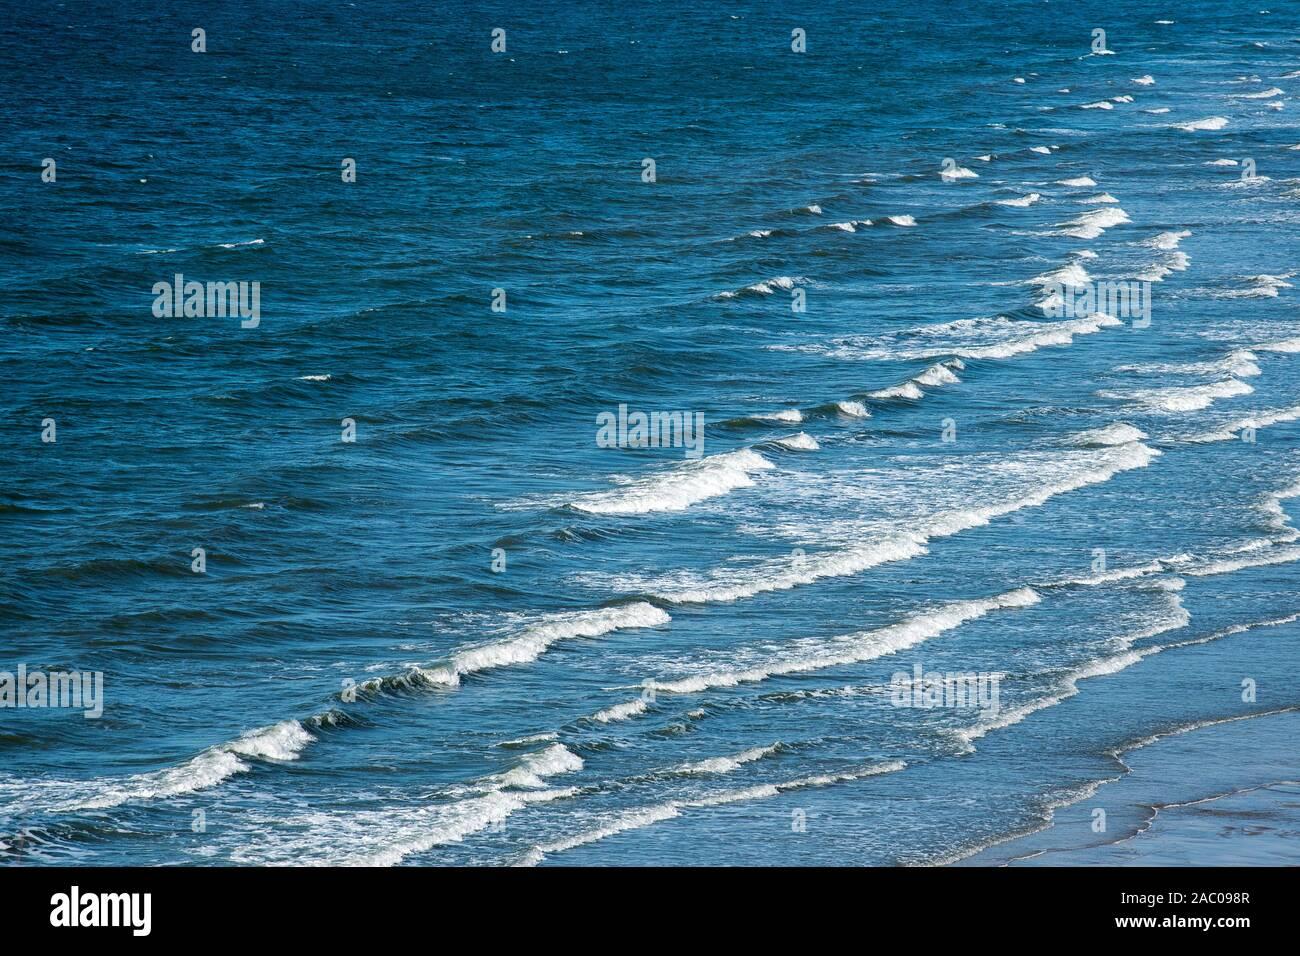 Meer Bei Trouville Sur Mer Normandie Frankreich Stock Photo Alamy